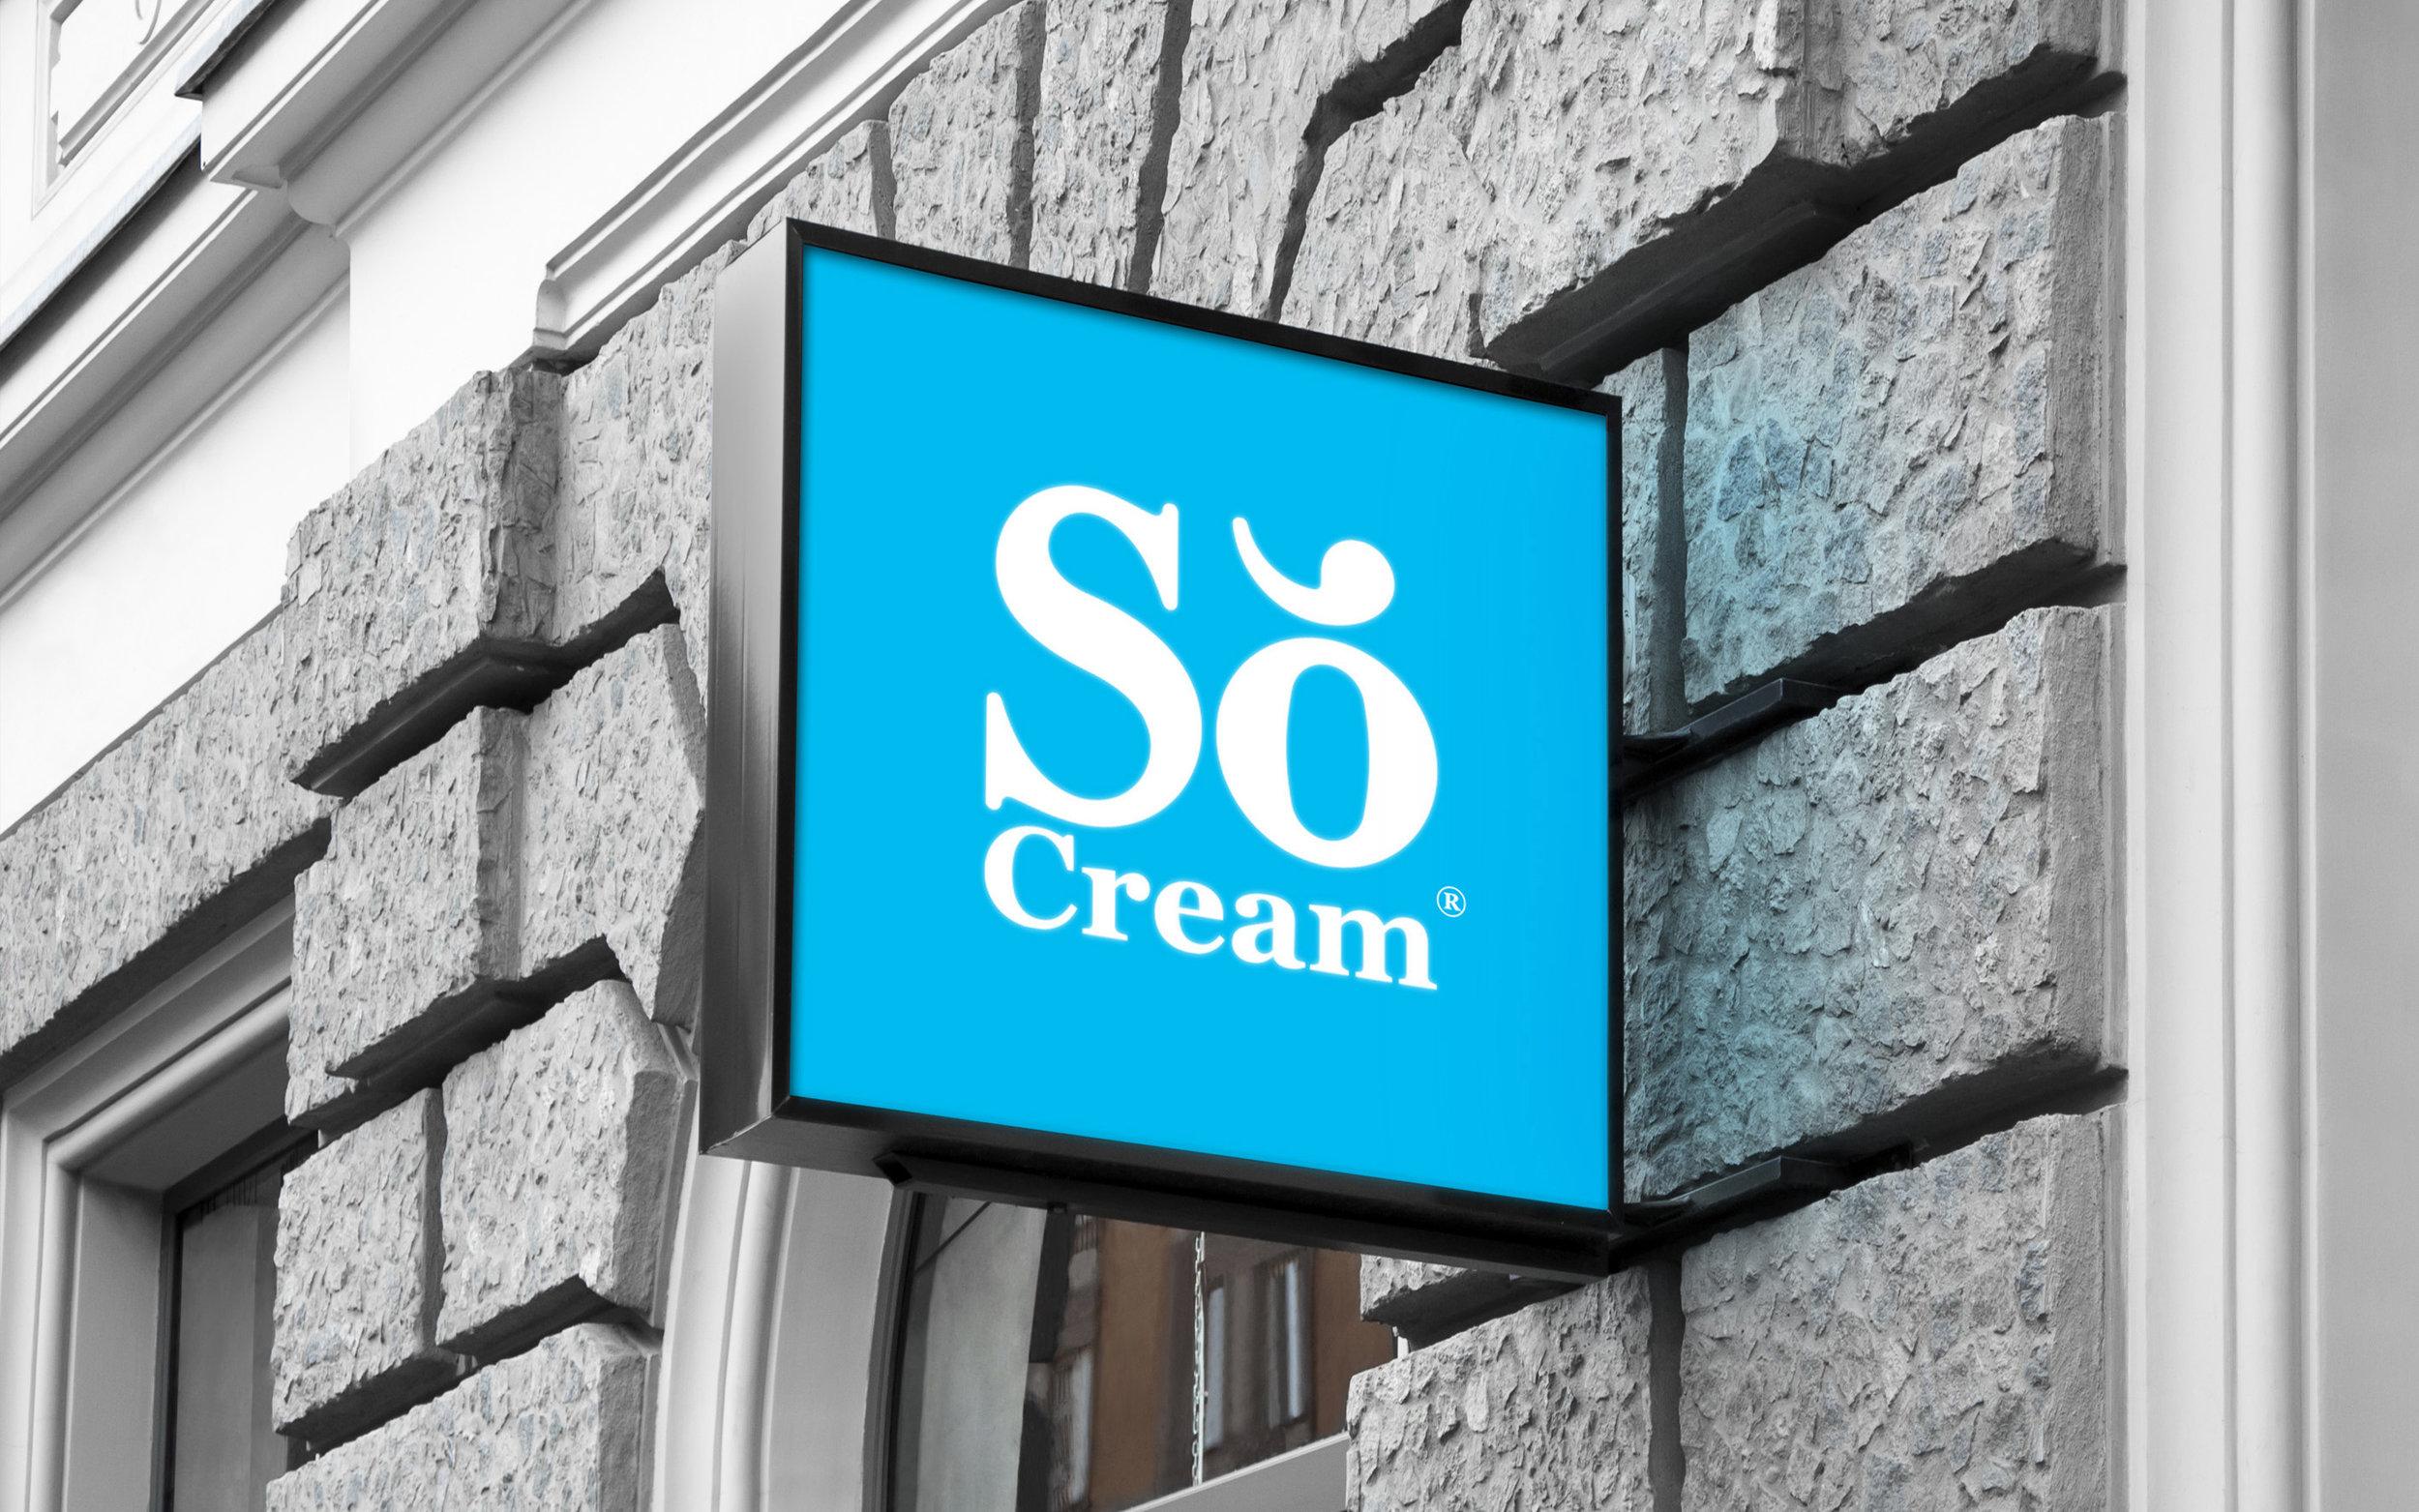 So Cream 7.jpg